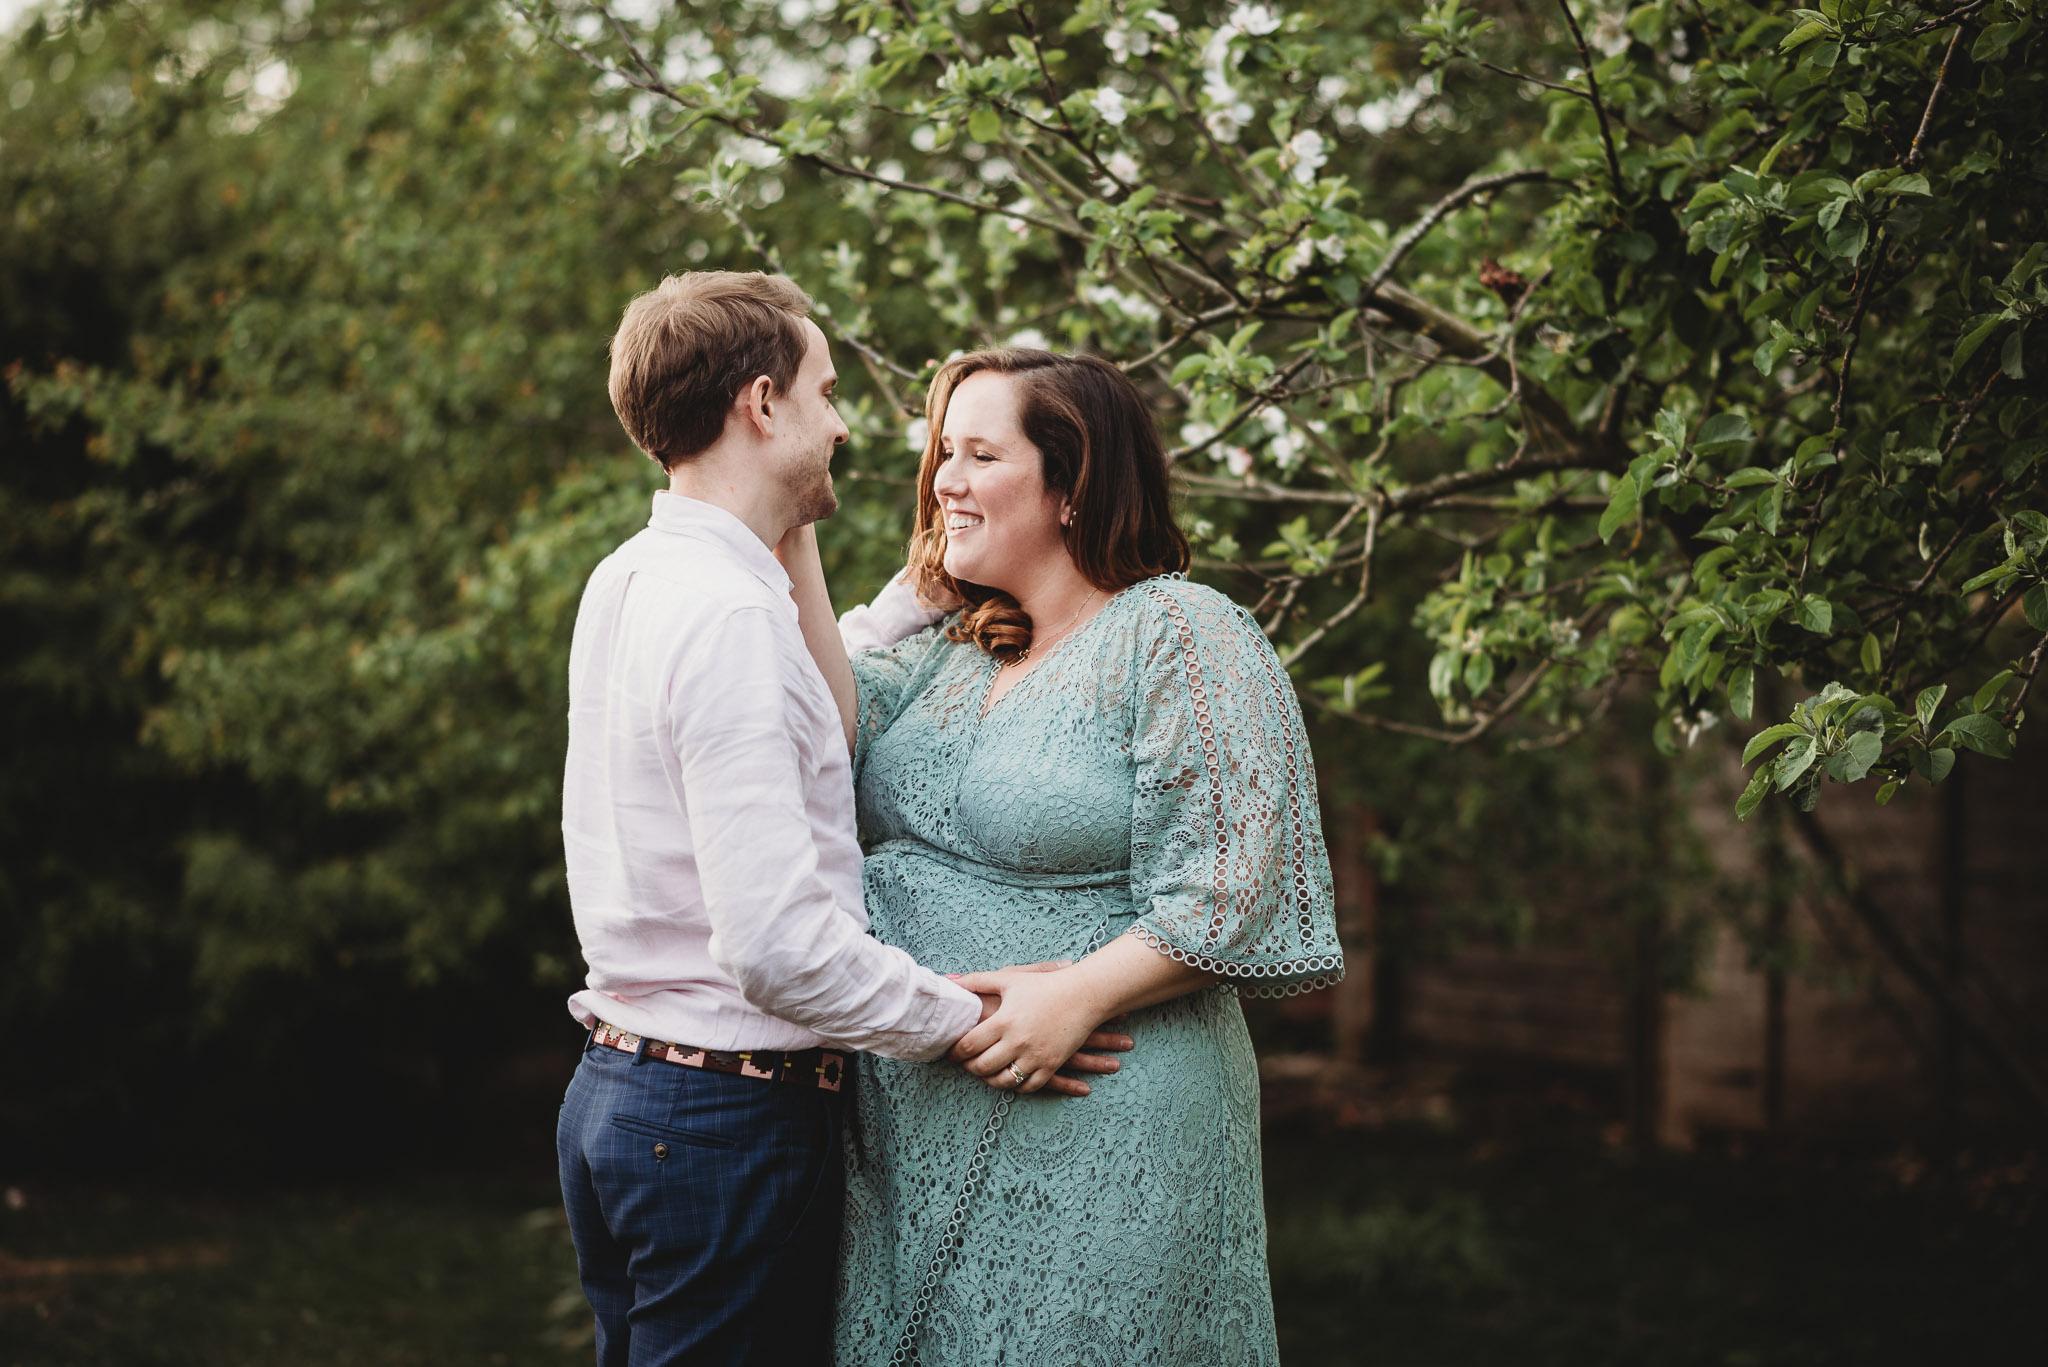 cambridge maternity photographer-108.jpg